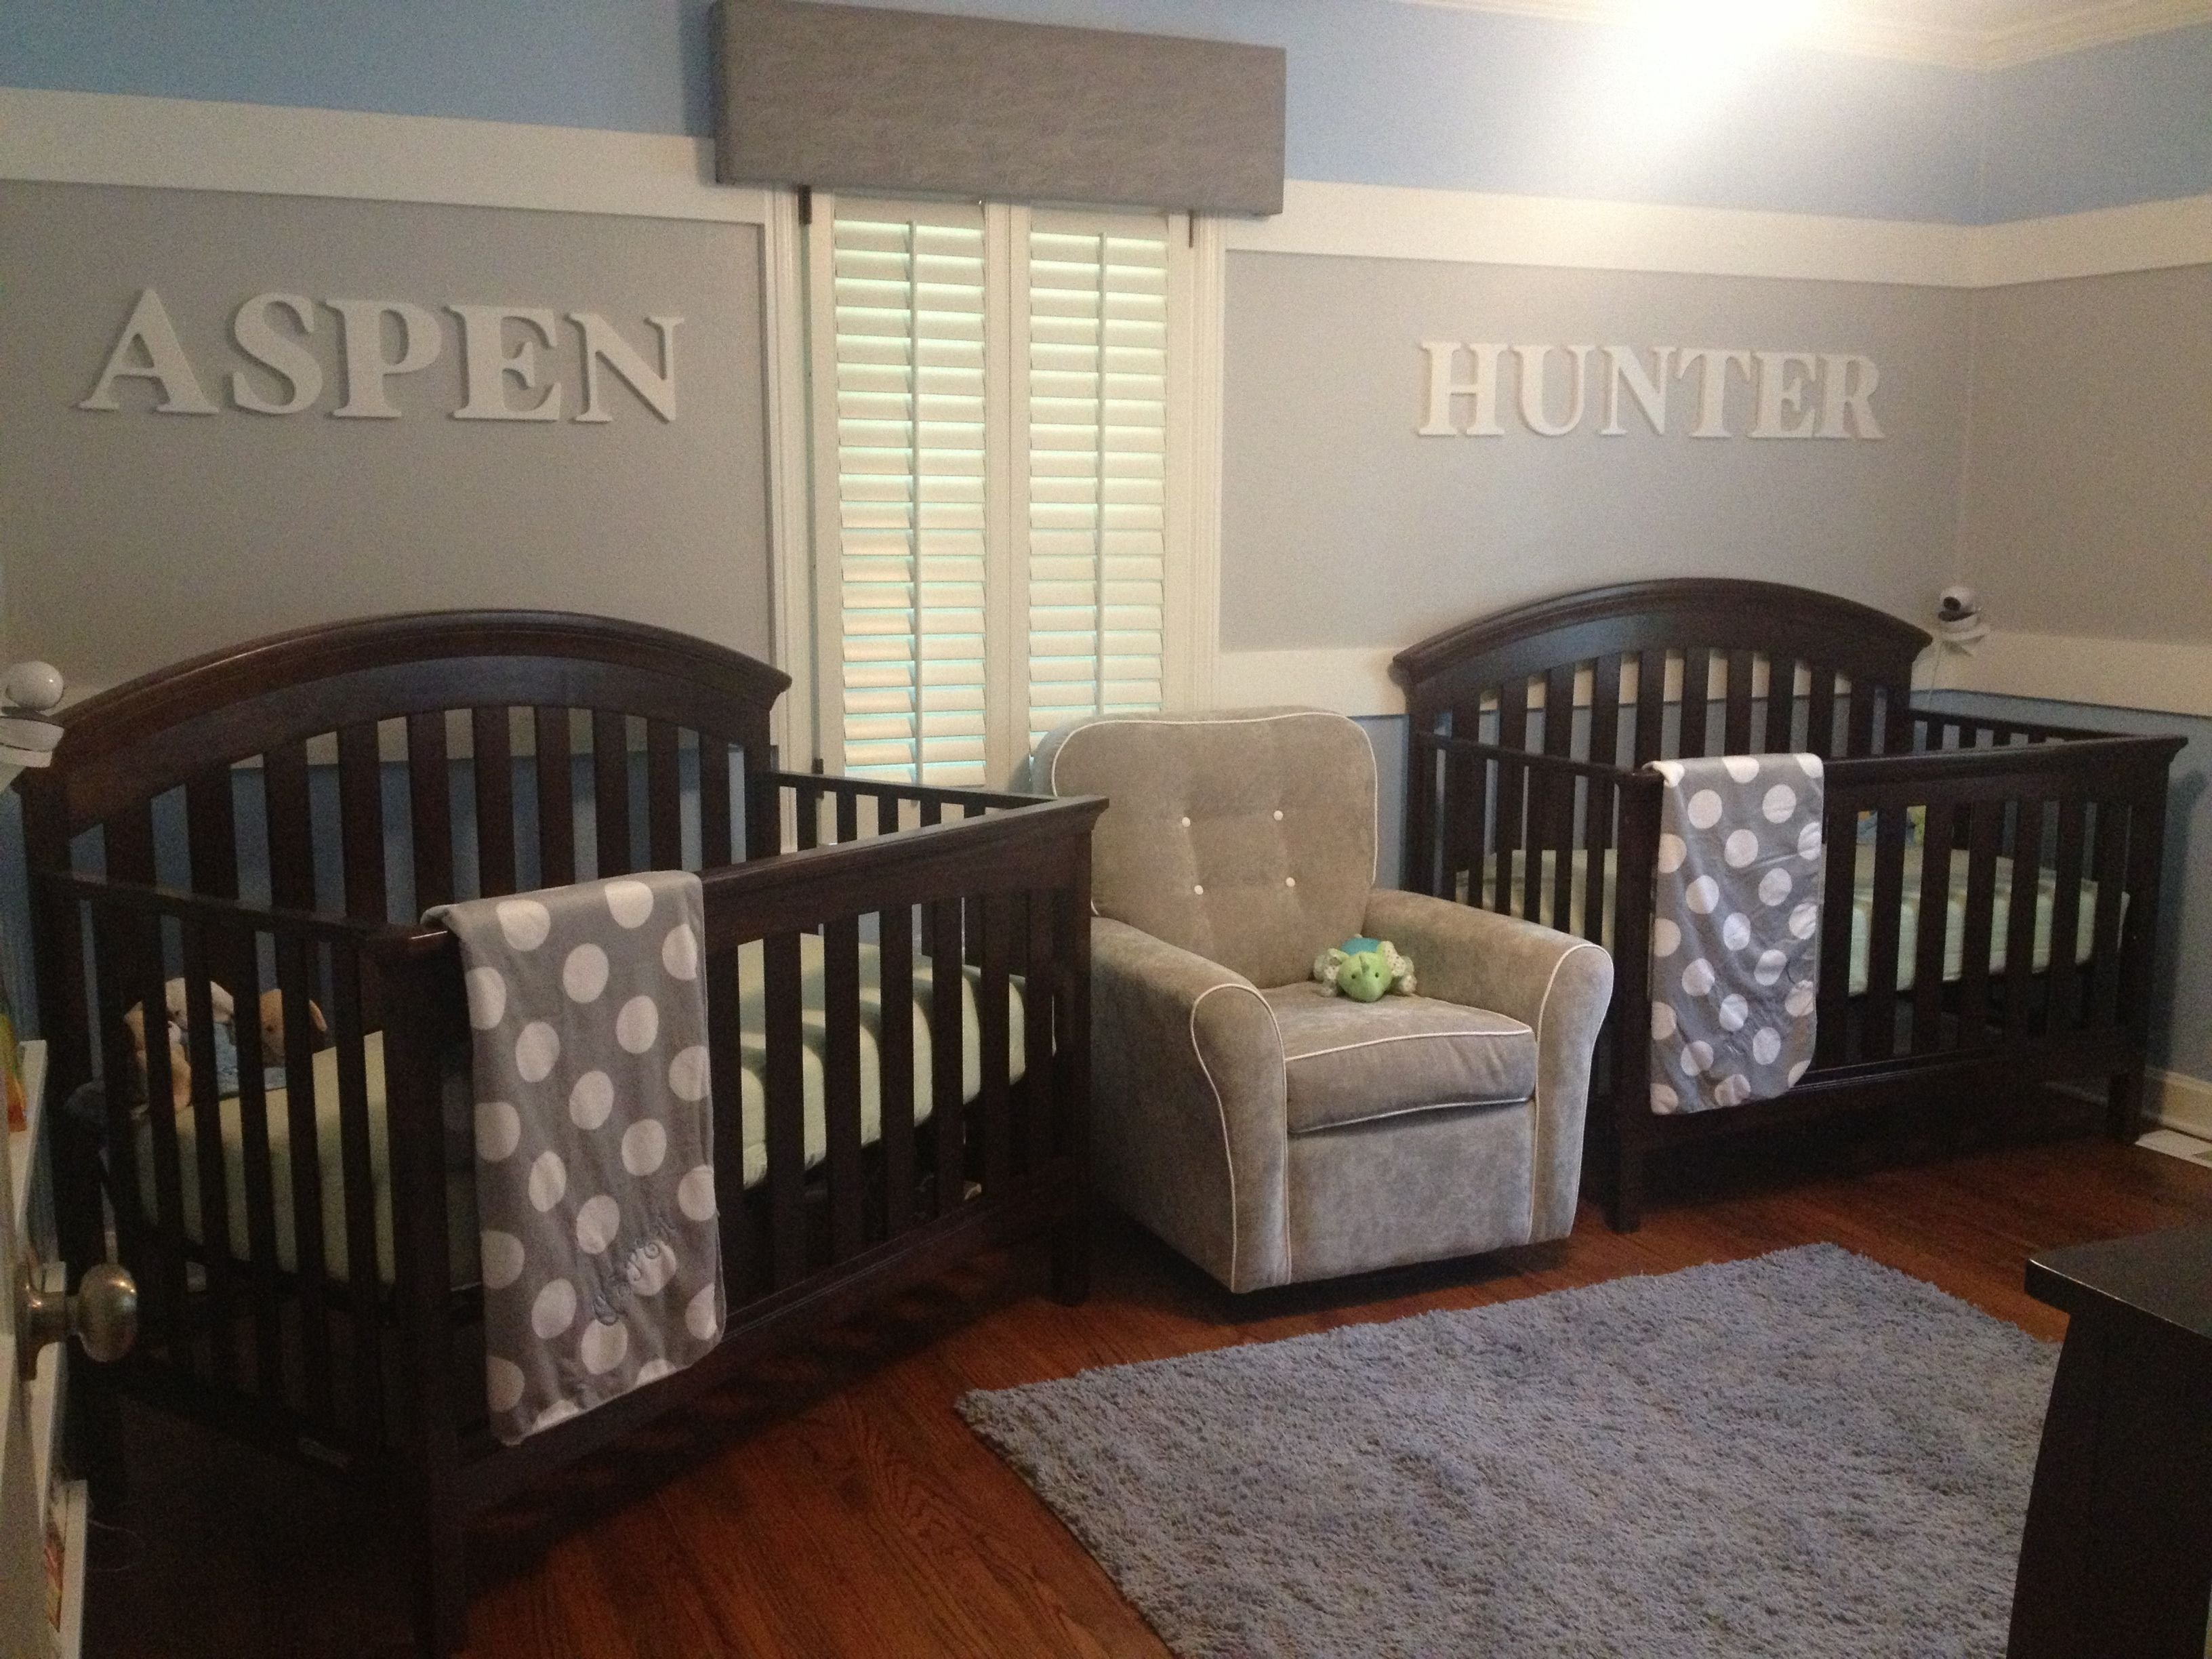 10 Lovely Baby Boy Nursery Ideas Pinterest vintage baby boy room ideas baby boy nursery ideas vintage as baby 1 2021